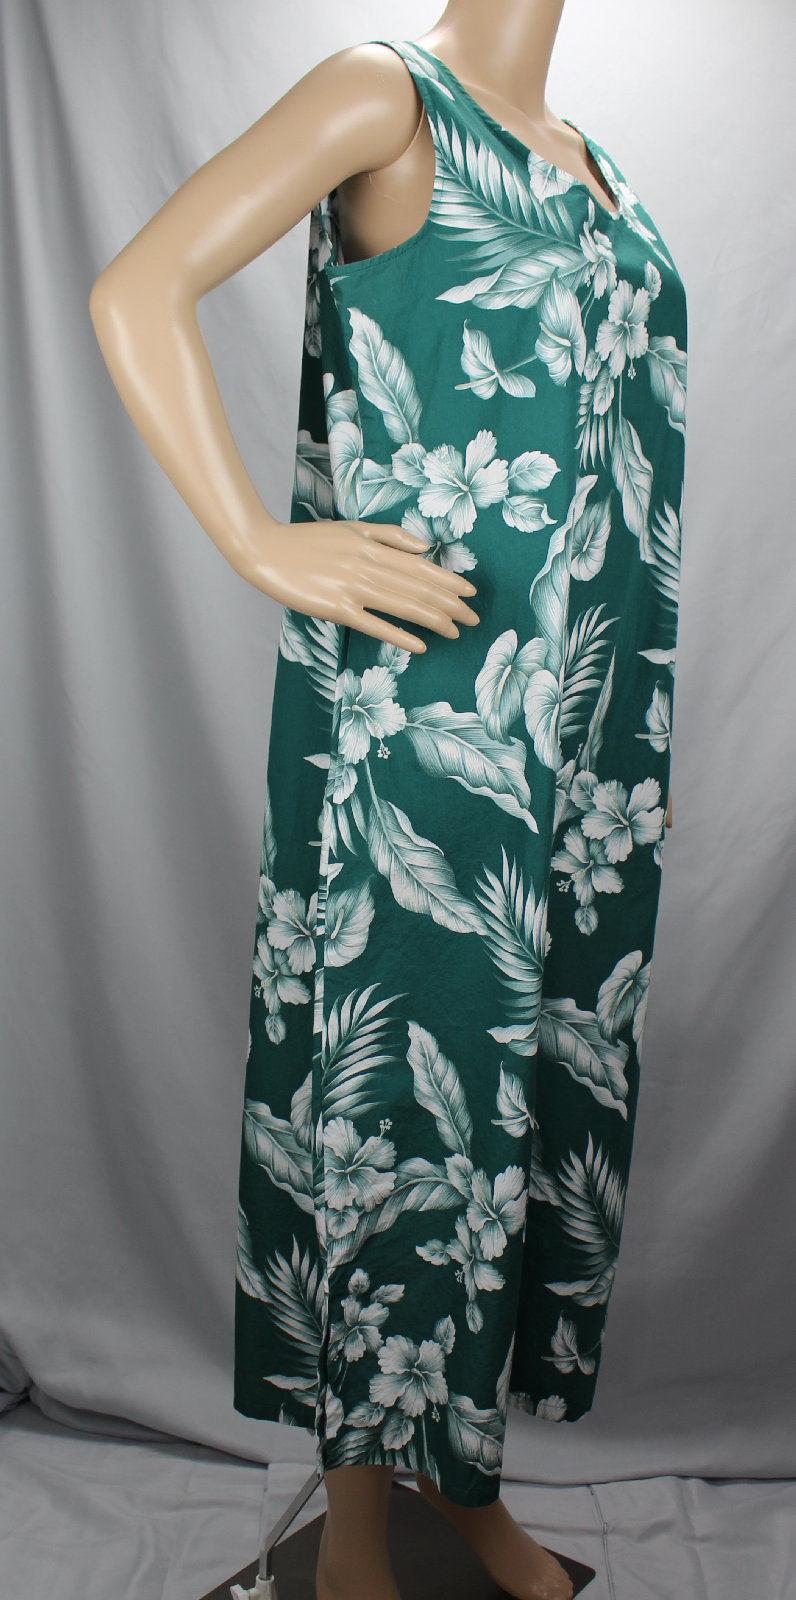 Hilo Hattie Long Large Hawaiian Dress Green White Scoop Neck Style 426 Aloha